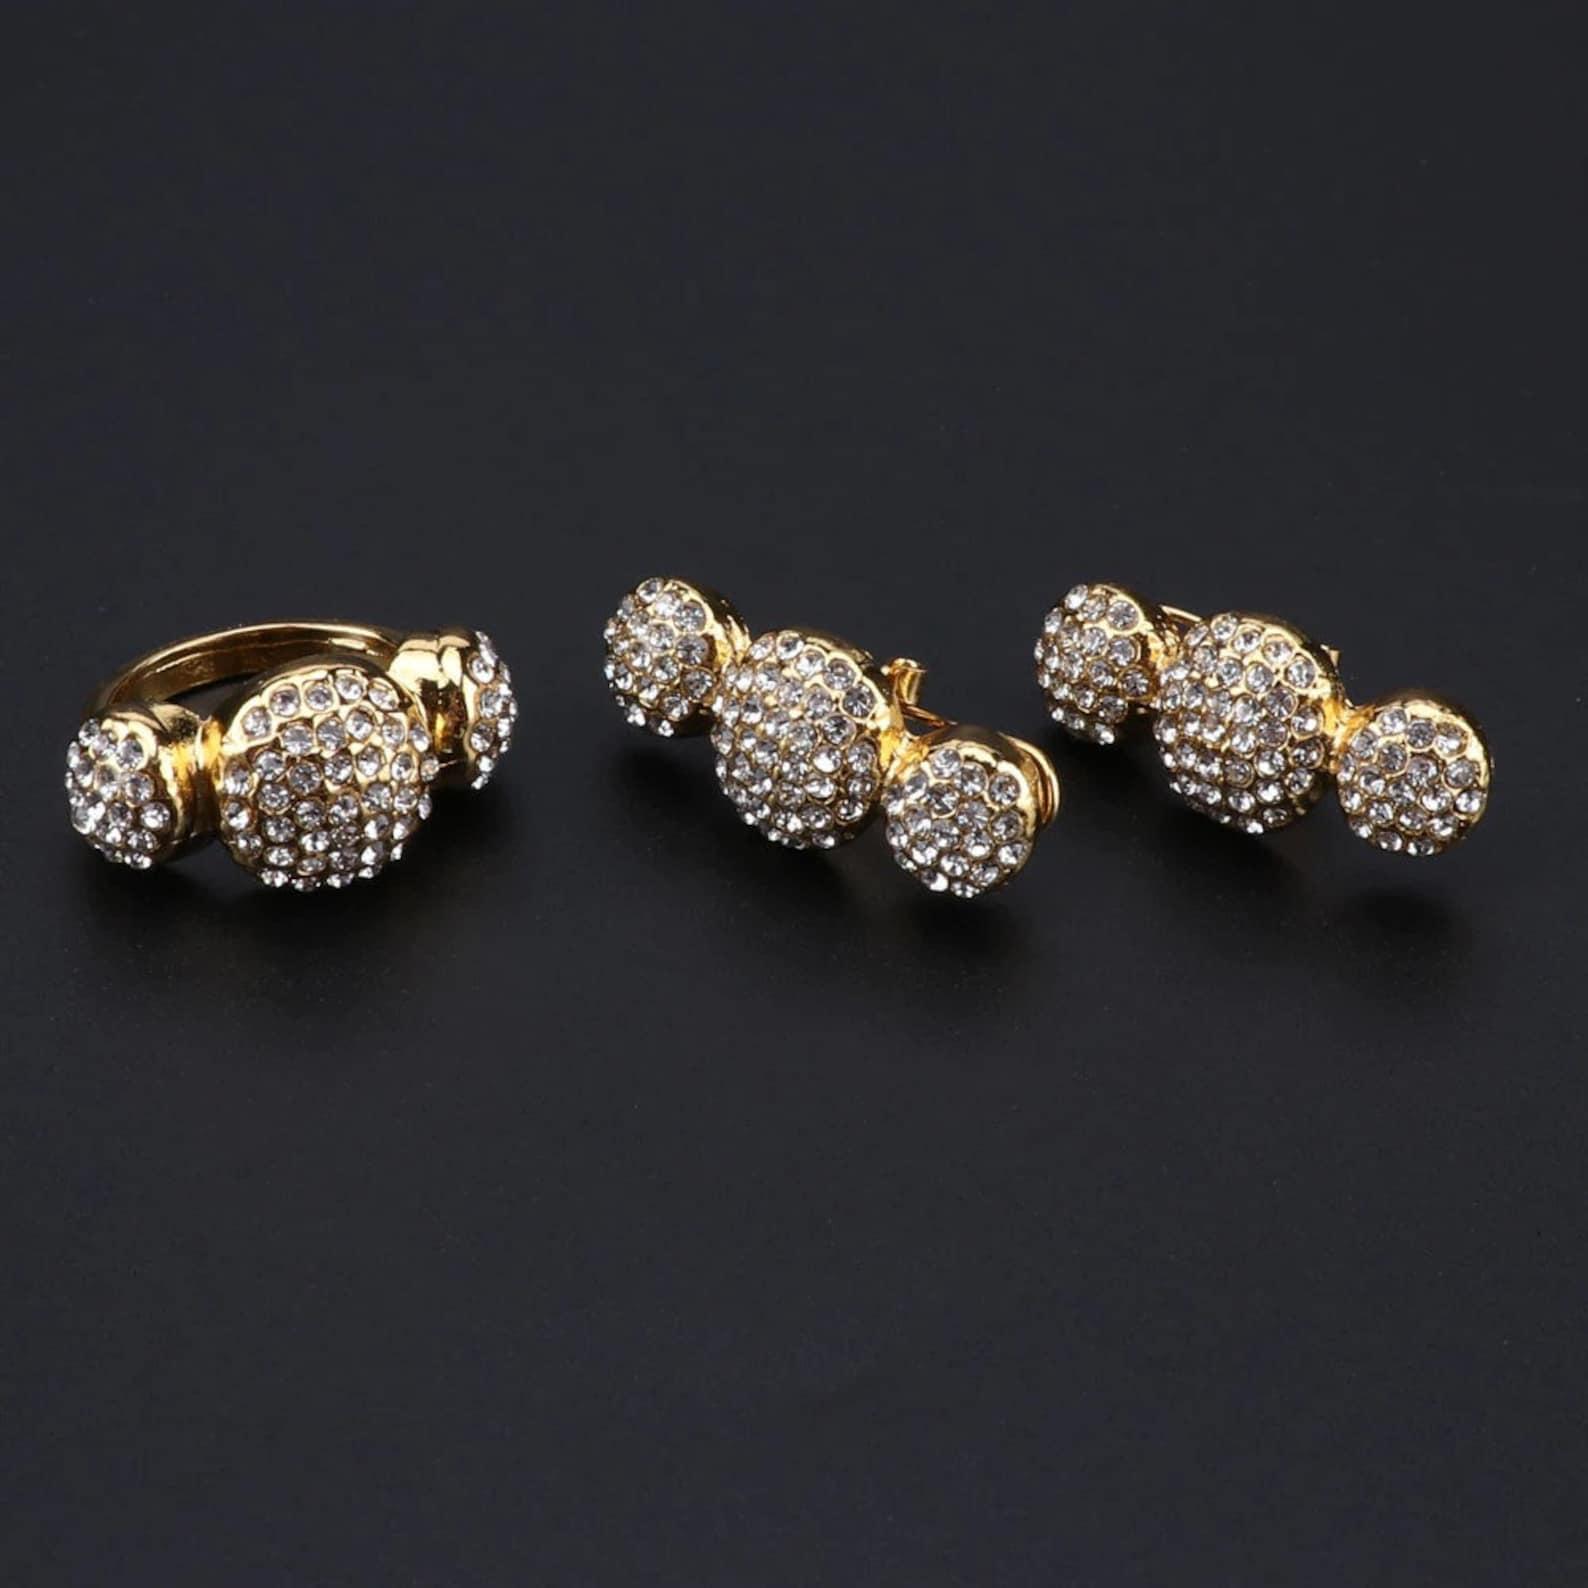 luxus afrikanische perlen schmuck set braut geschenk gold